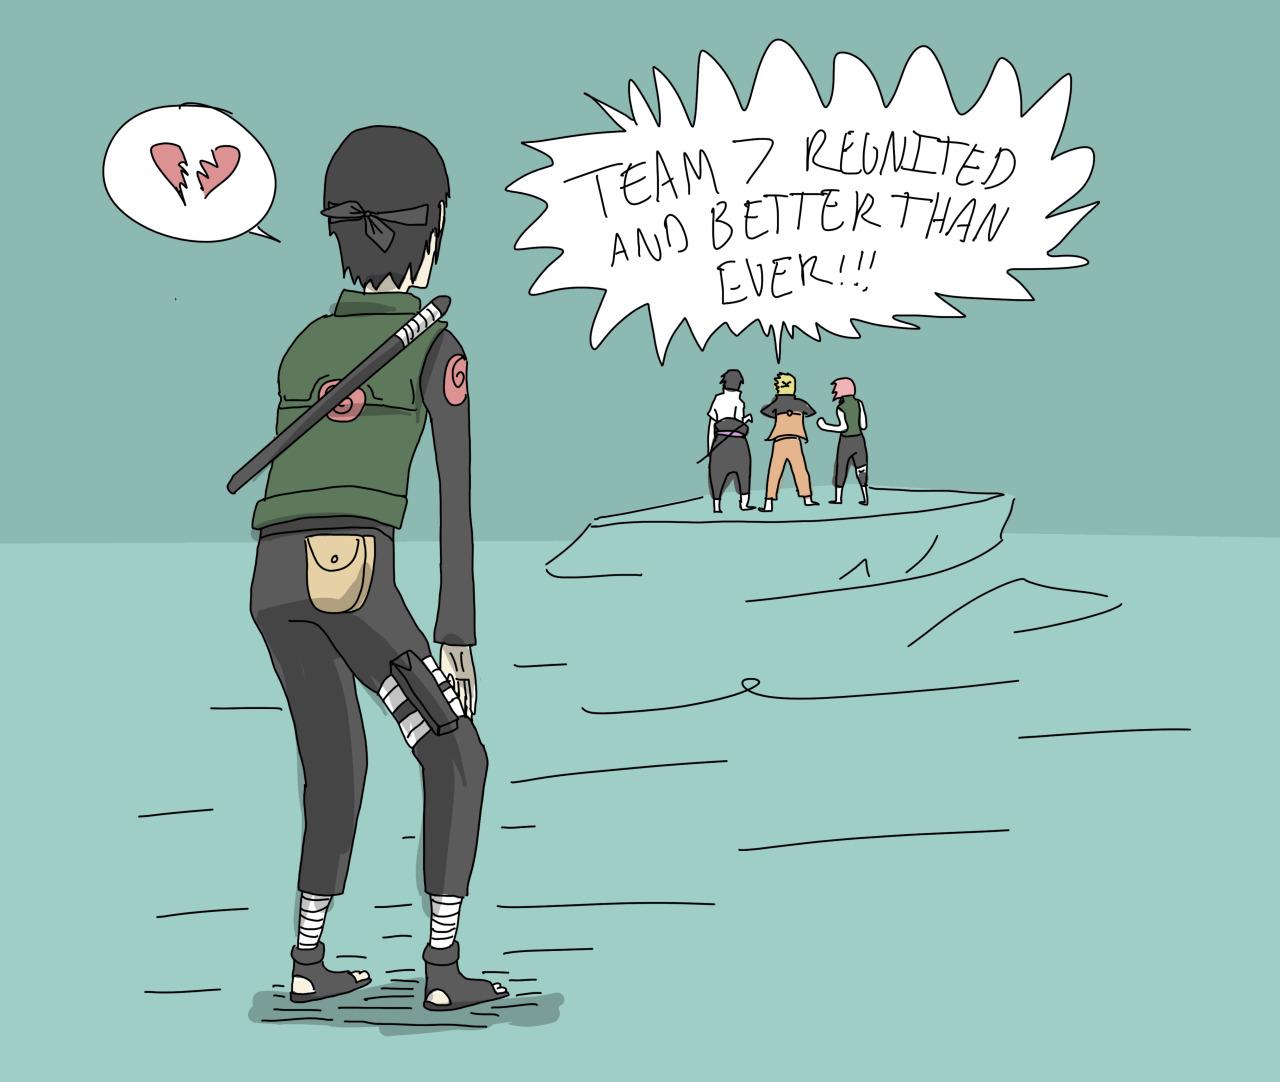 Team 7: Thoughts and feelings Tumblr_n1p127nXJY1tu4s3eo1_1280